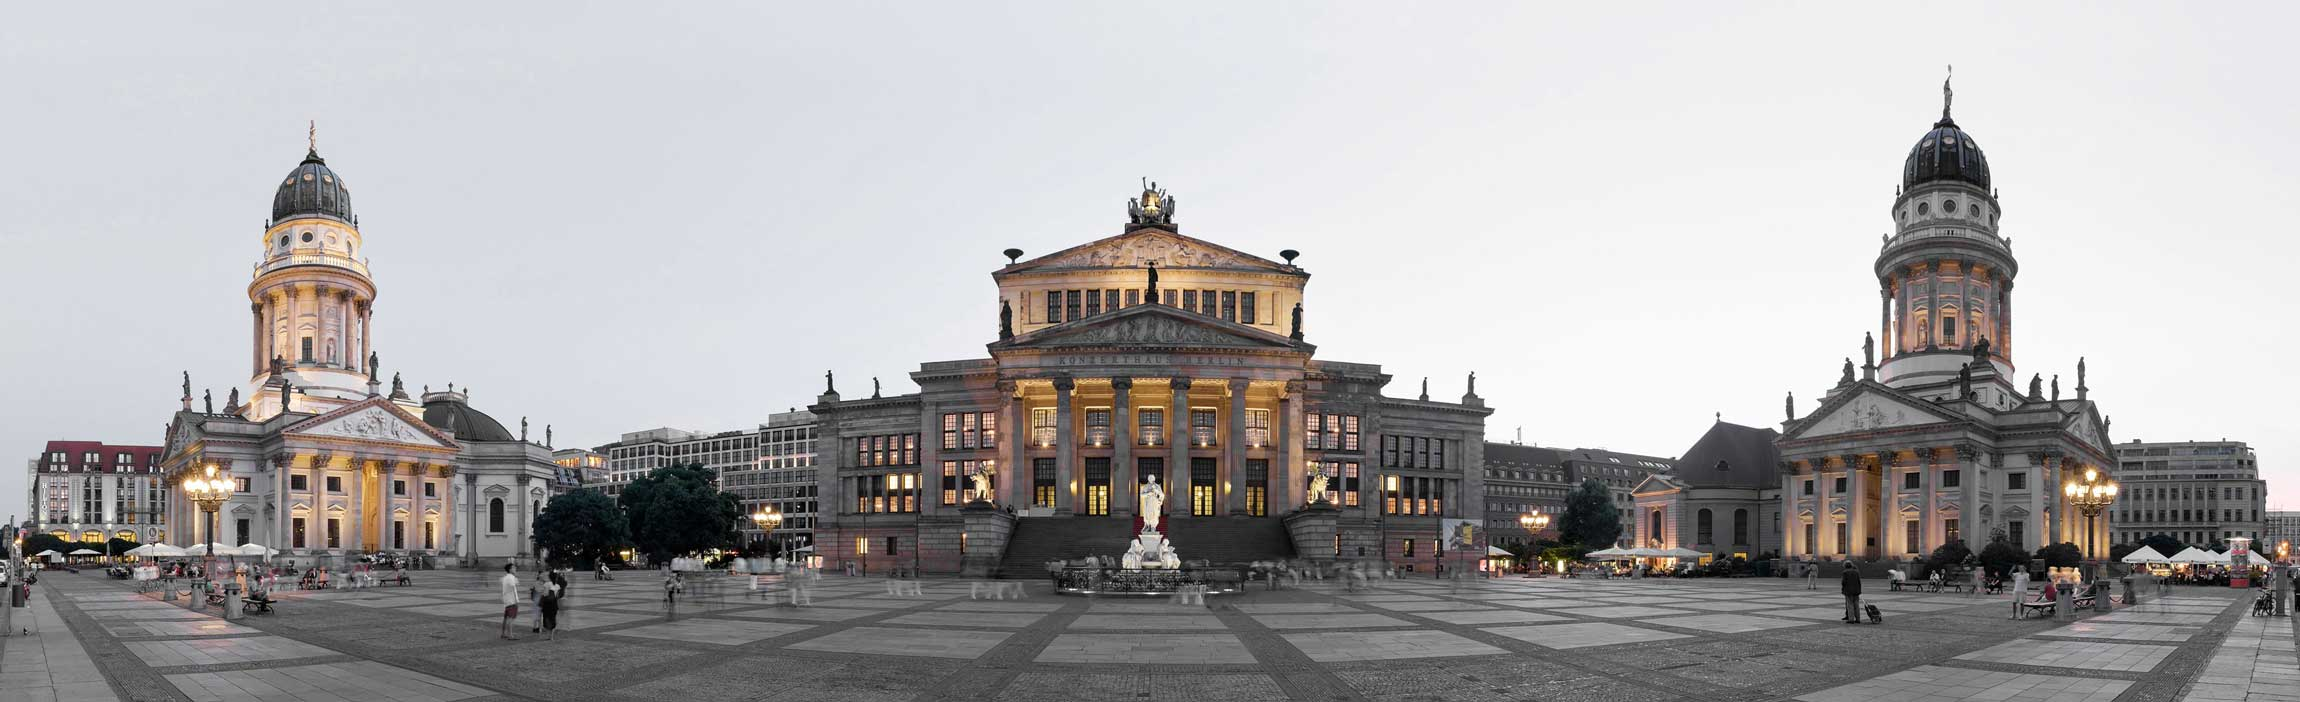 Zahnarzt Berlin - Zahnarztpraxis am Gendarmenmarkt liegt direkt gegenüber dem Deutschen Dom